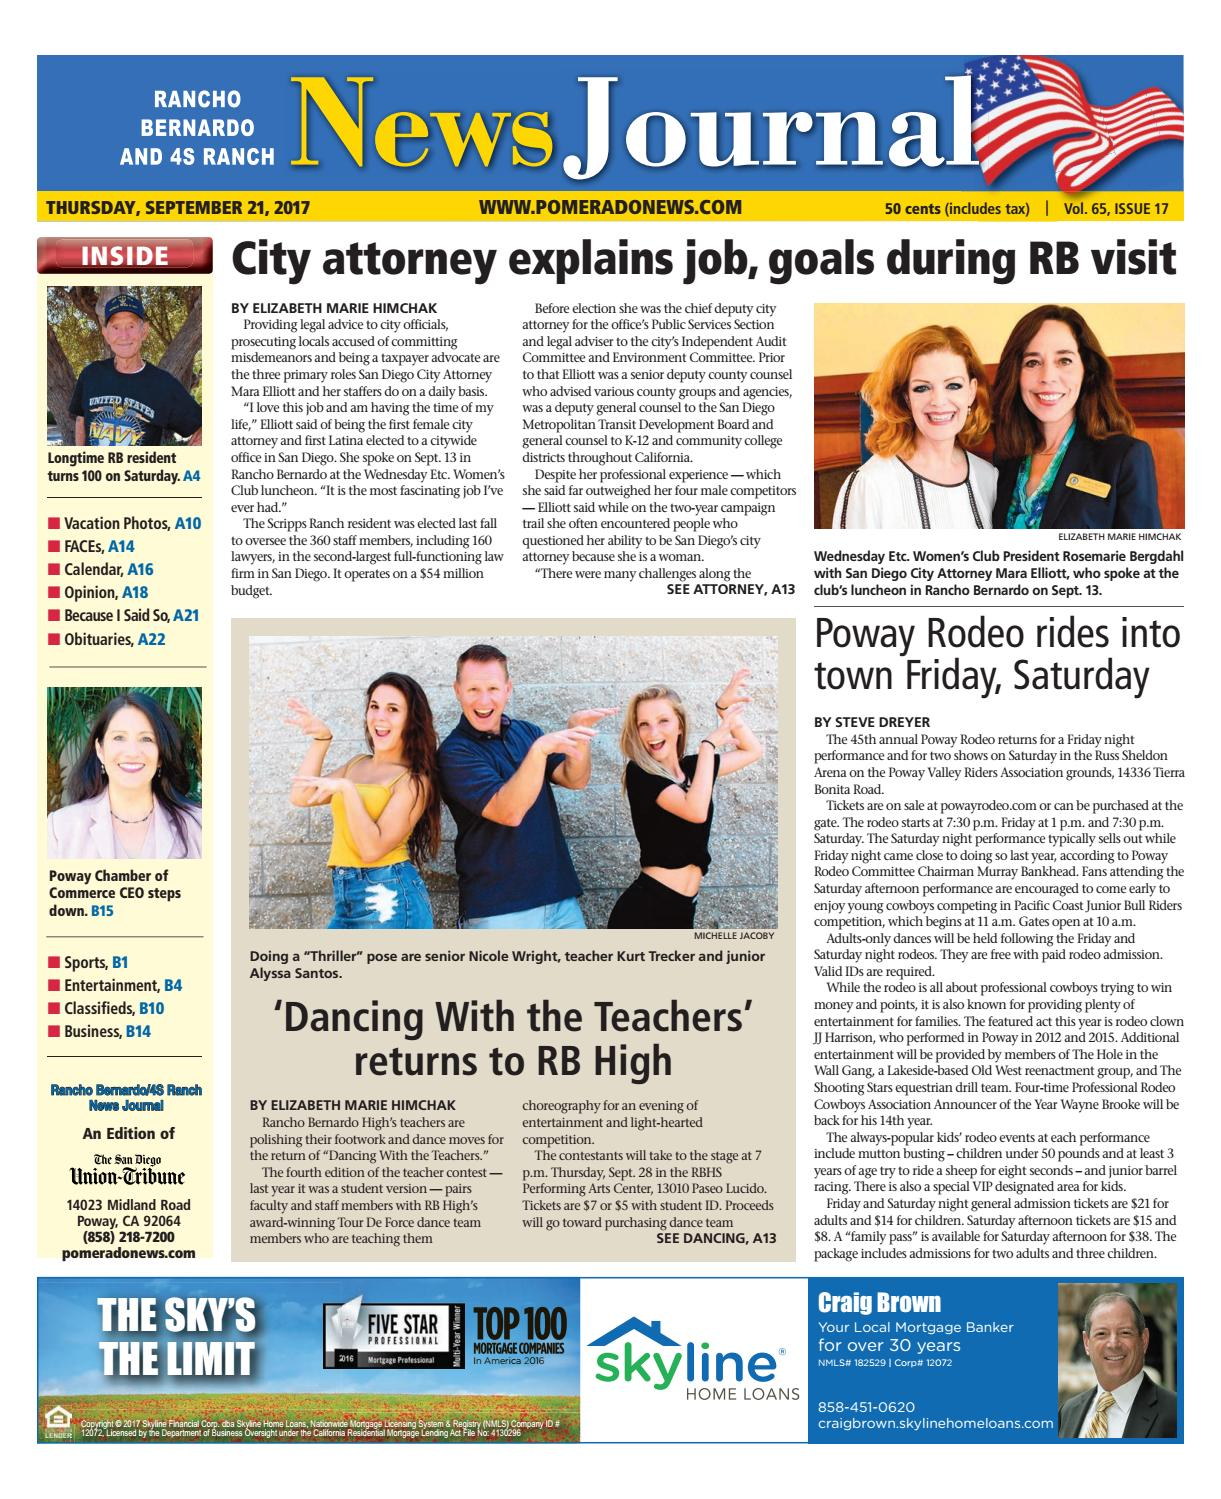 b9228fd6338fa1 Rancho Bernardo News Journal 09 21 17 by MainStreet Media - issuu